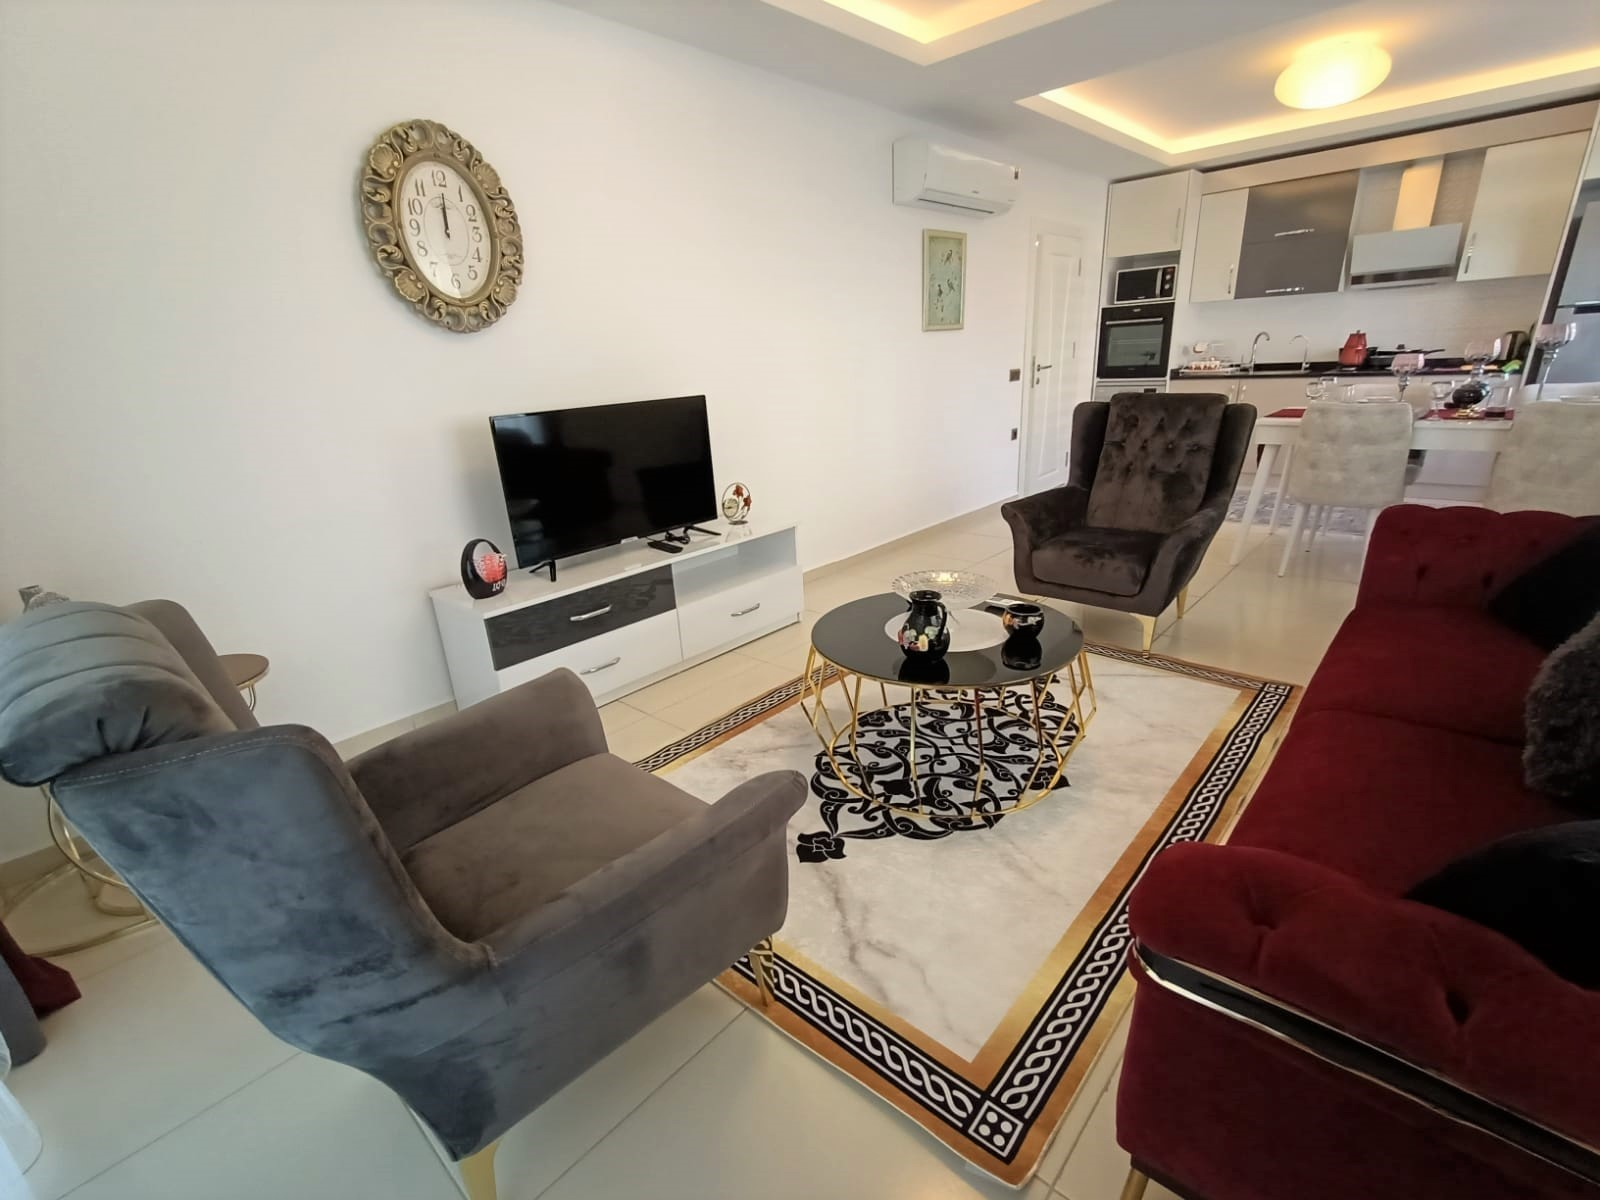 Двухкомнатная квартира с мебелью в районе Махмутлар - Фото 8